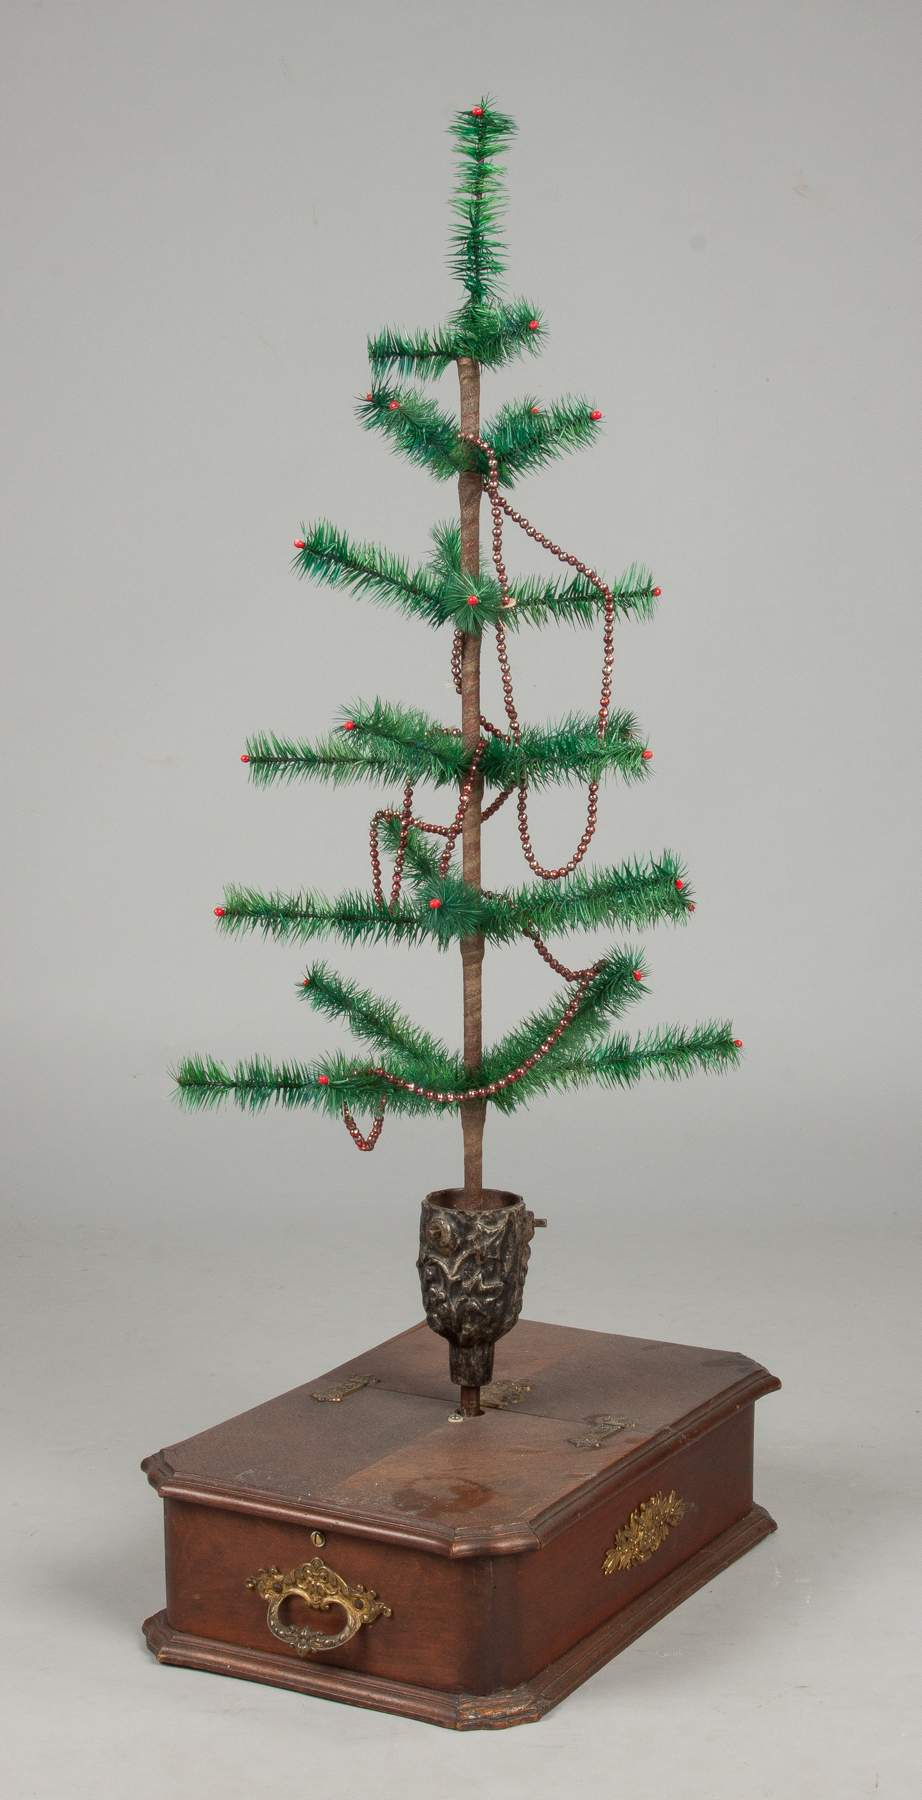 Revolving Christmas Tree Photo Albums Revolving Christmas